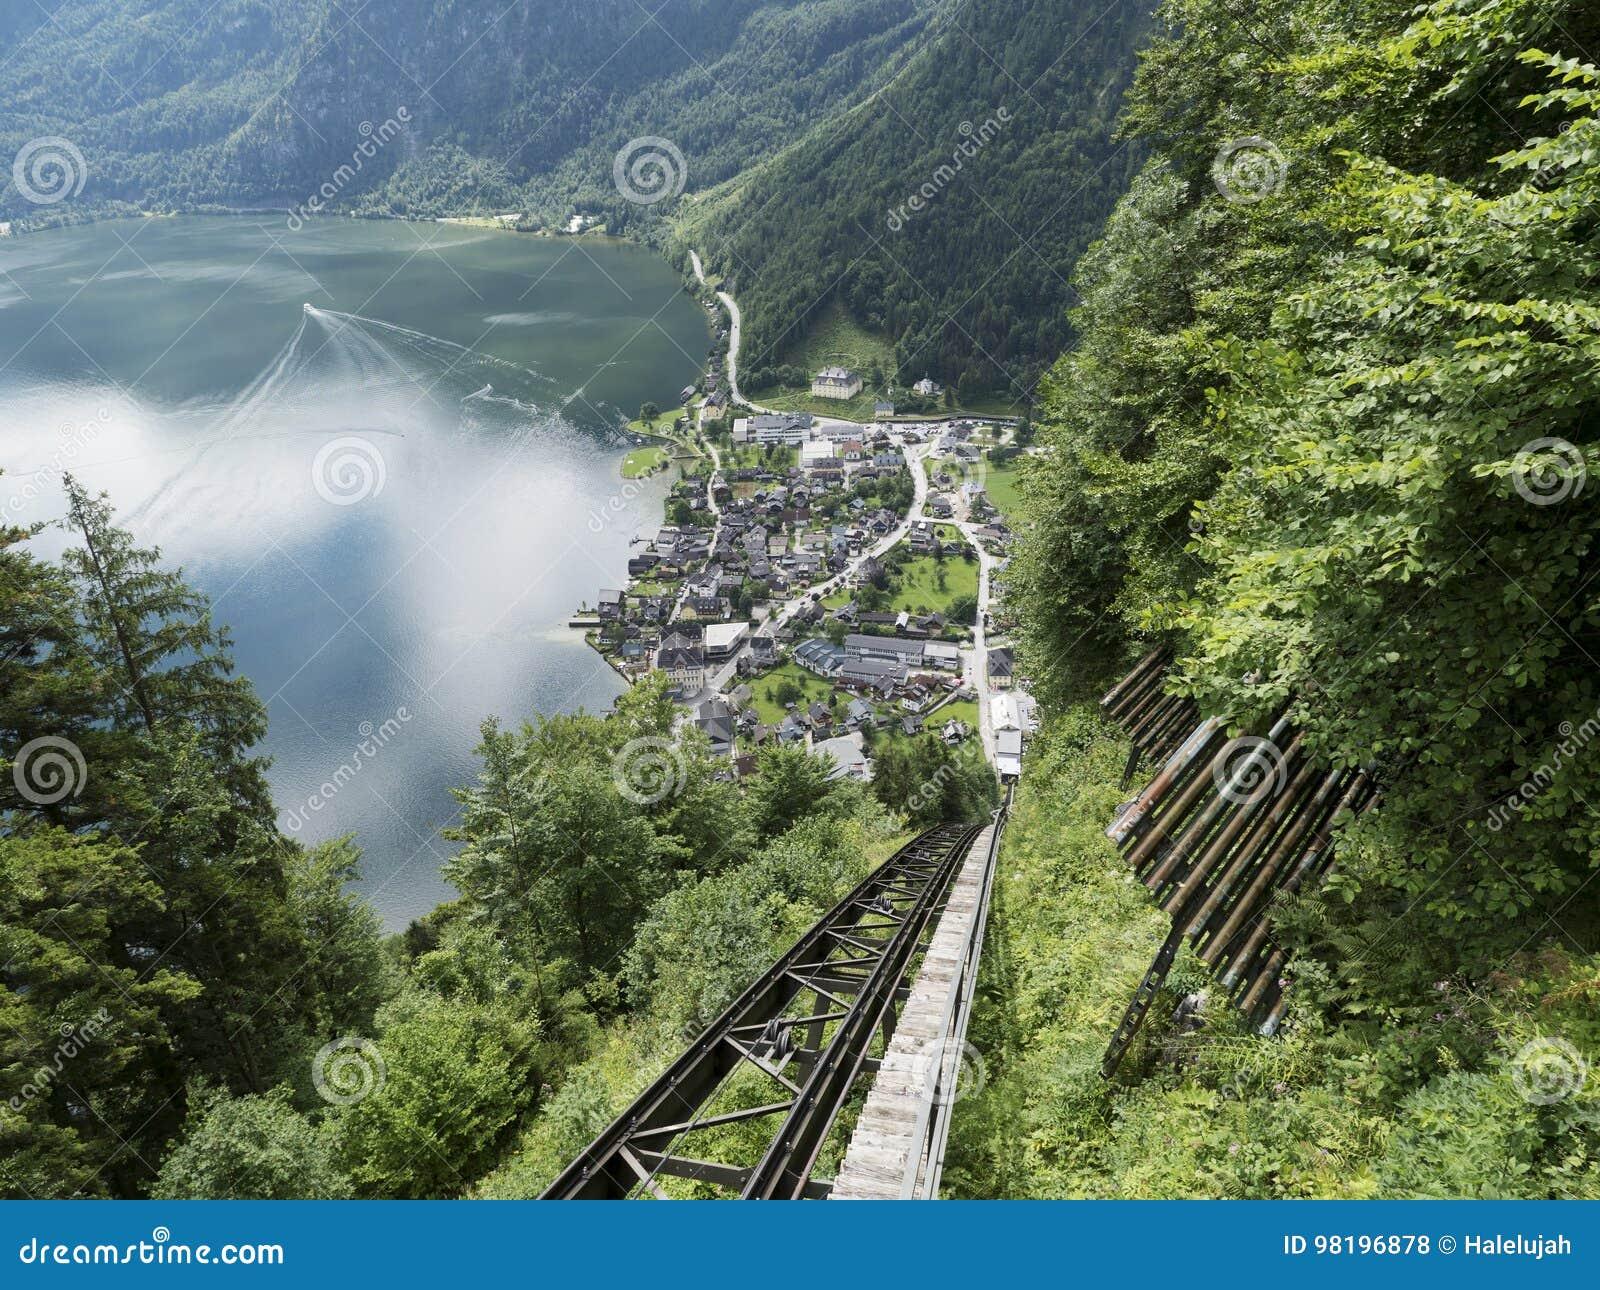 High-altitude cog railway, rail lift in Hallstatt. Mountain lake, Alpine massif, beautiful canyon in Austria.